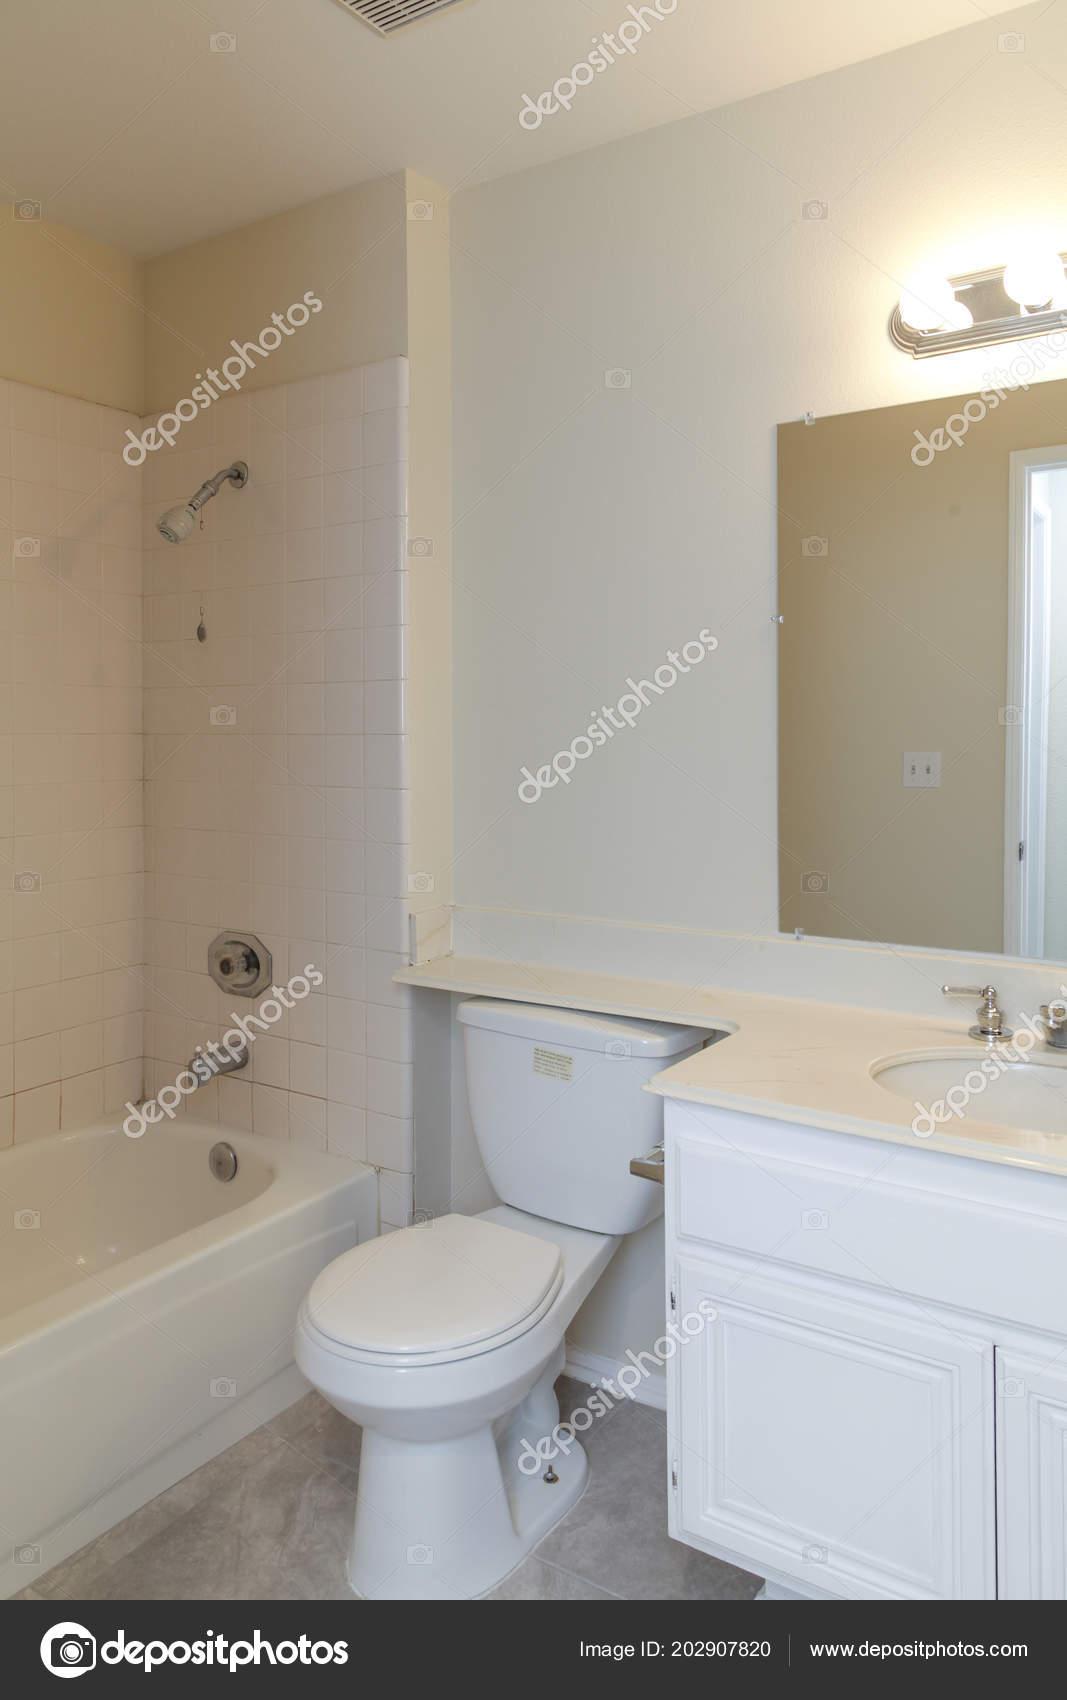 Interior Decorating Term Refers Decorating Furnishing Interior ...